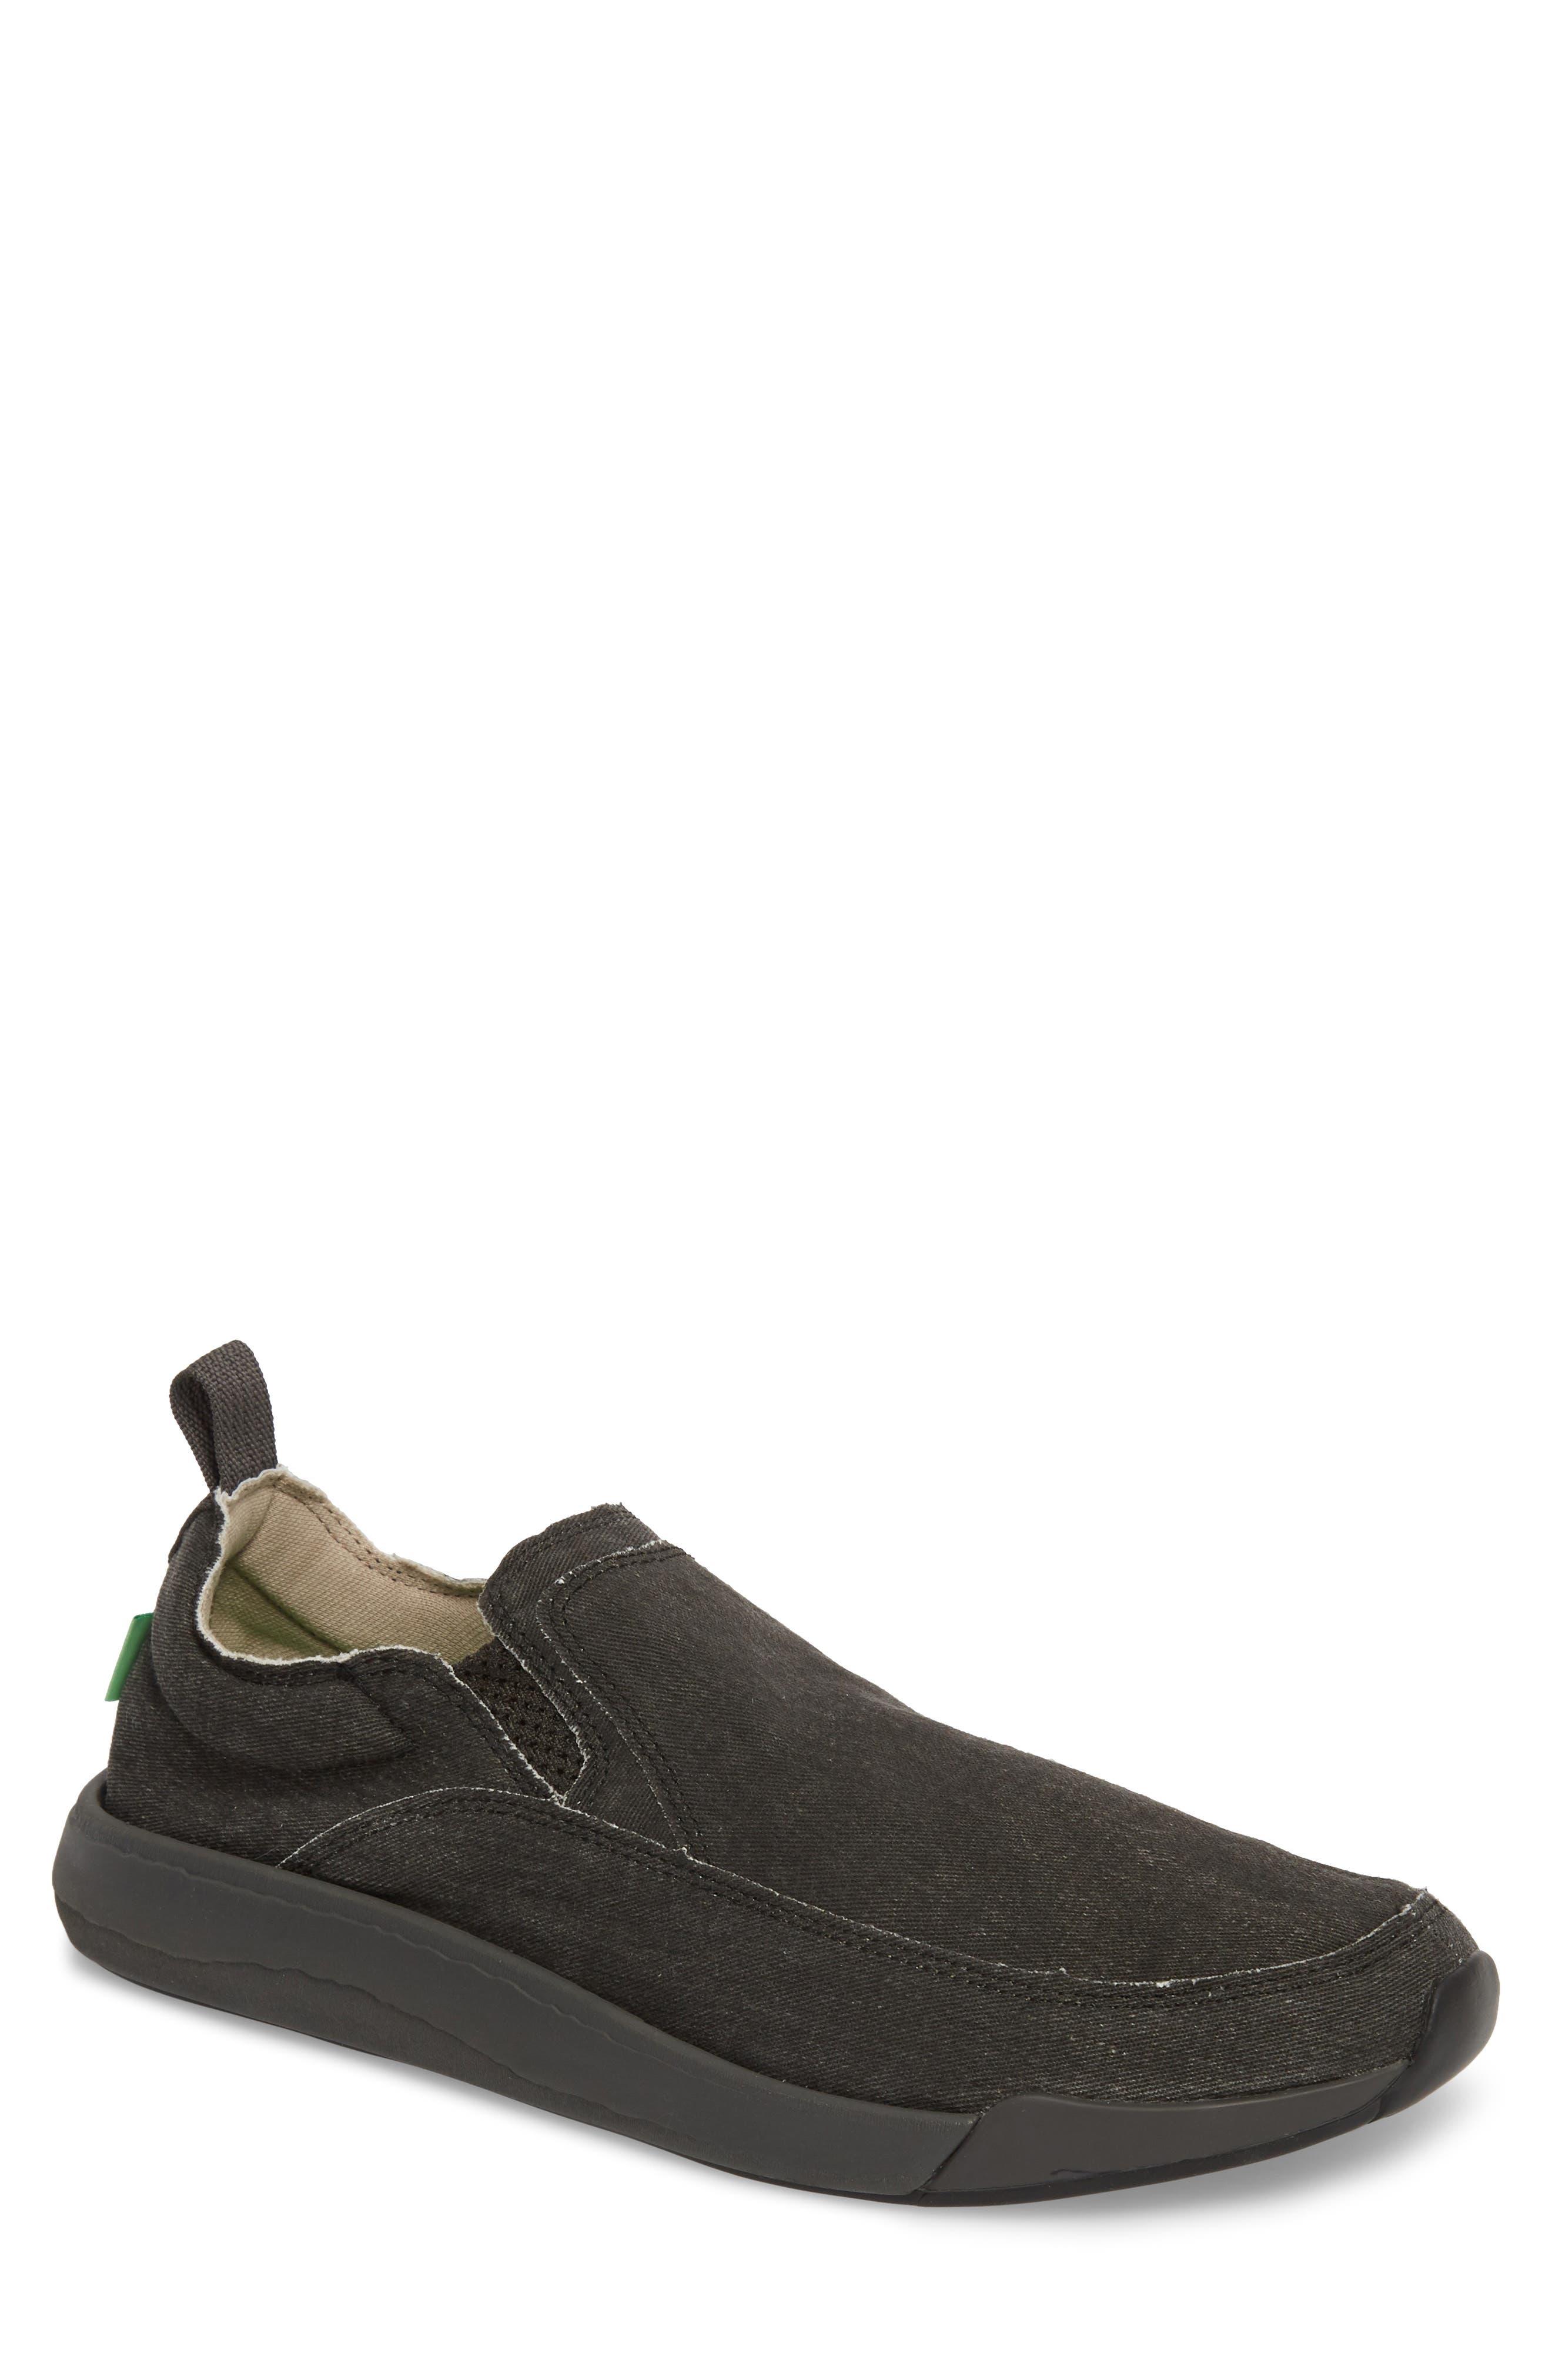 Chiba Quest Slip-On Sneaker,                         Main,                         color, Black/ Black